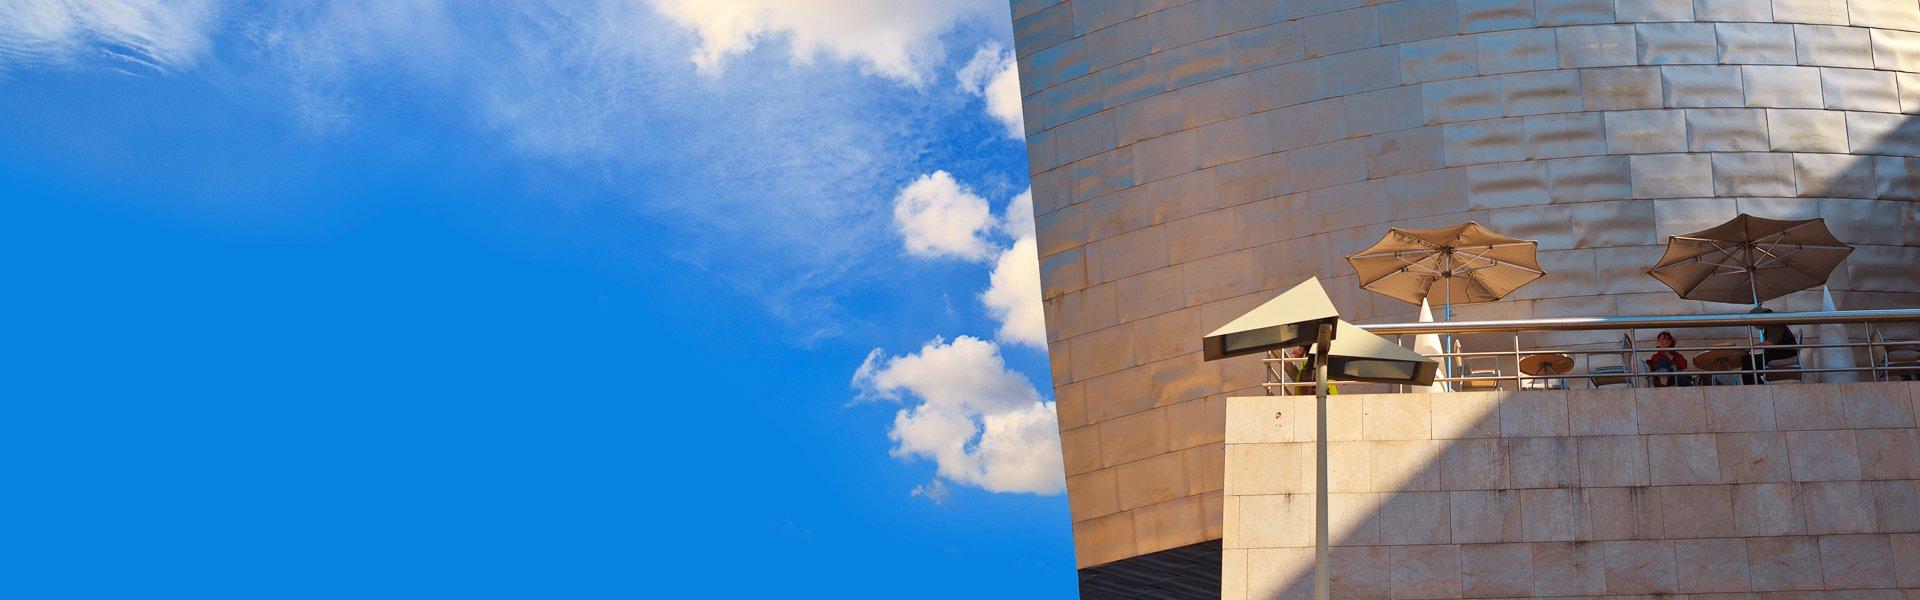 Guggenheim in Bilbao, Spanje